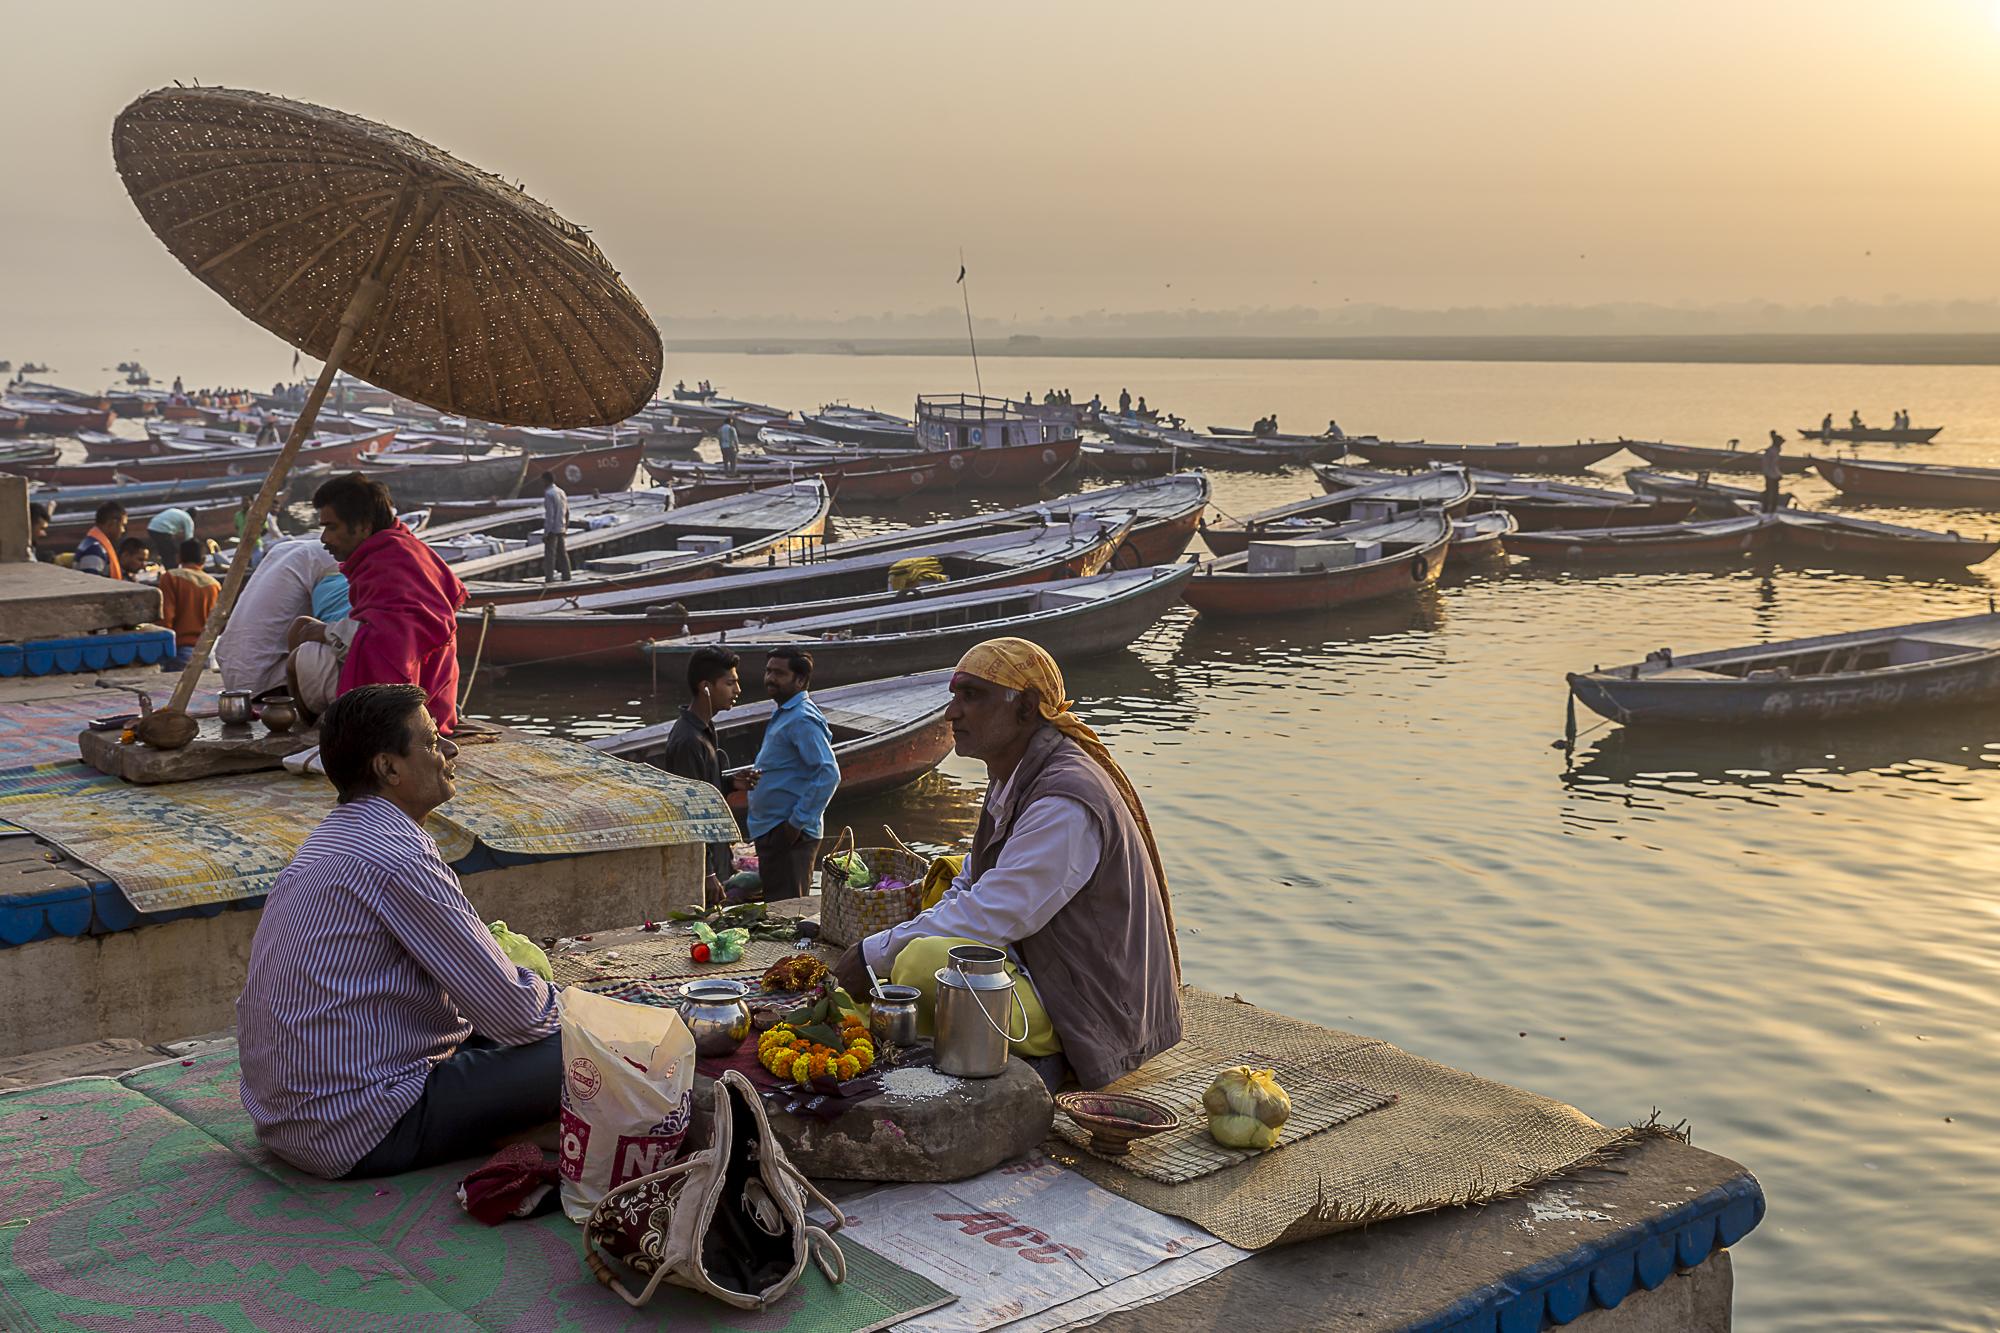 Varanasi, India - morning chat with a priest, 3 Days* - Barbara Huber